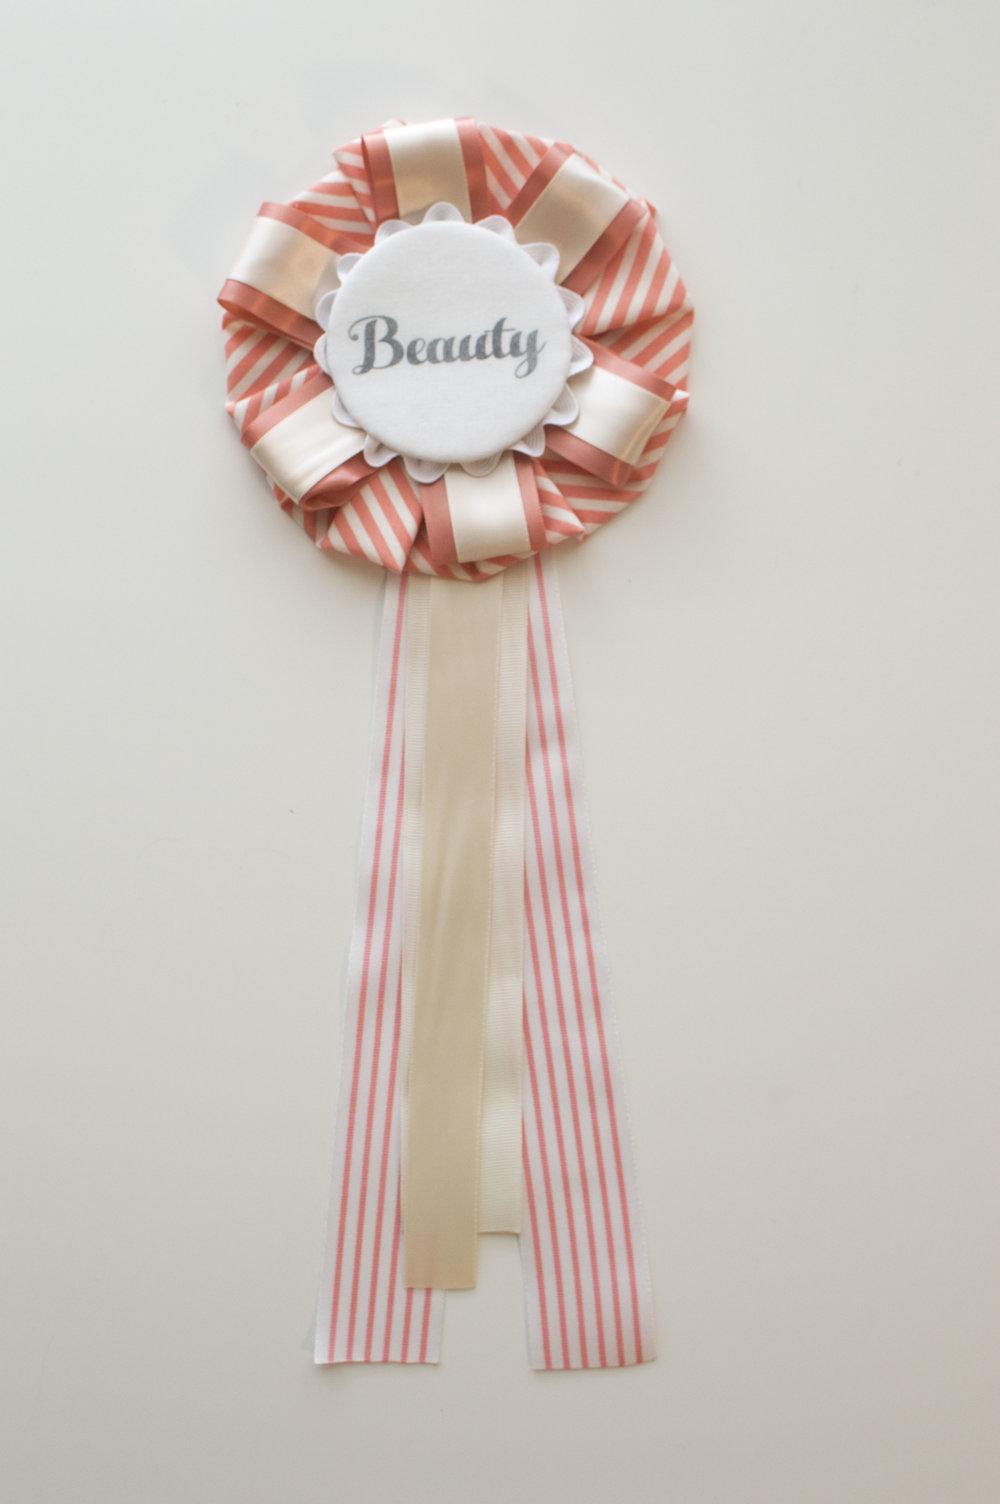 Beauty Ribbon Rosette